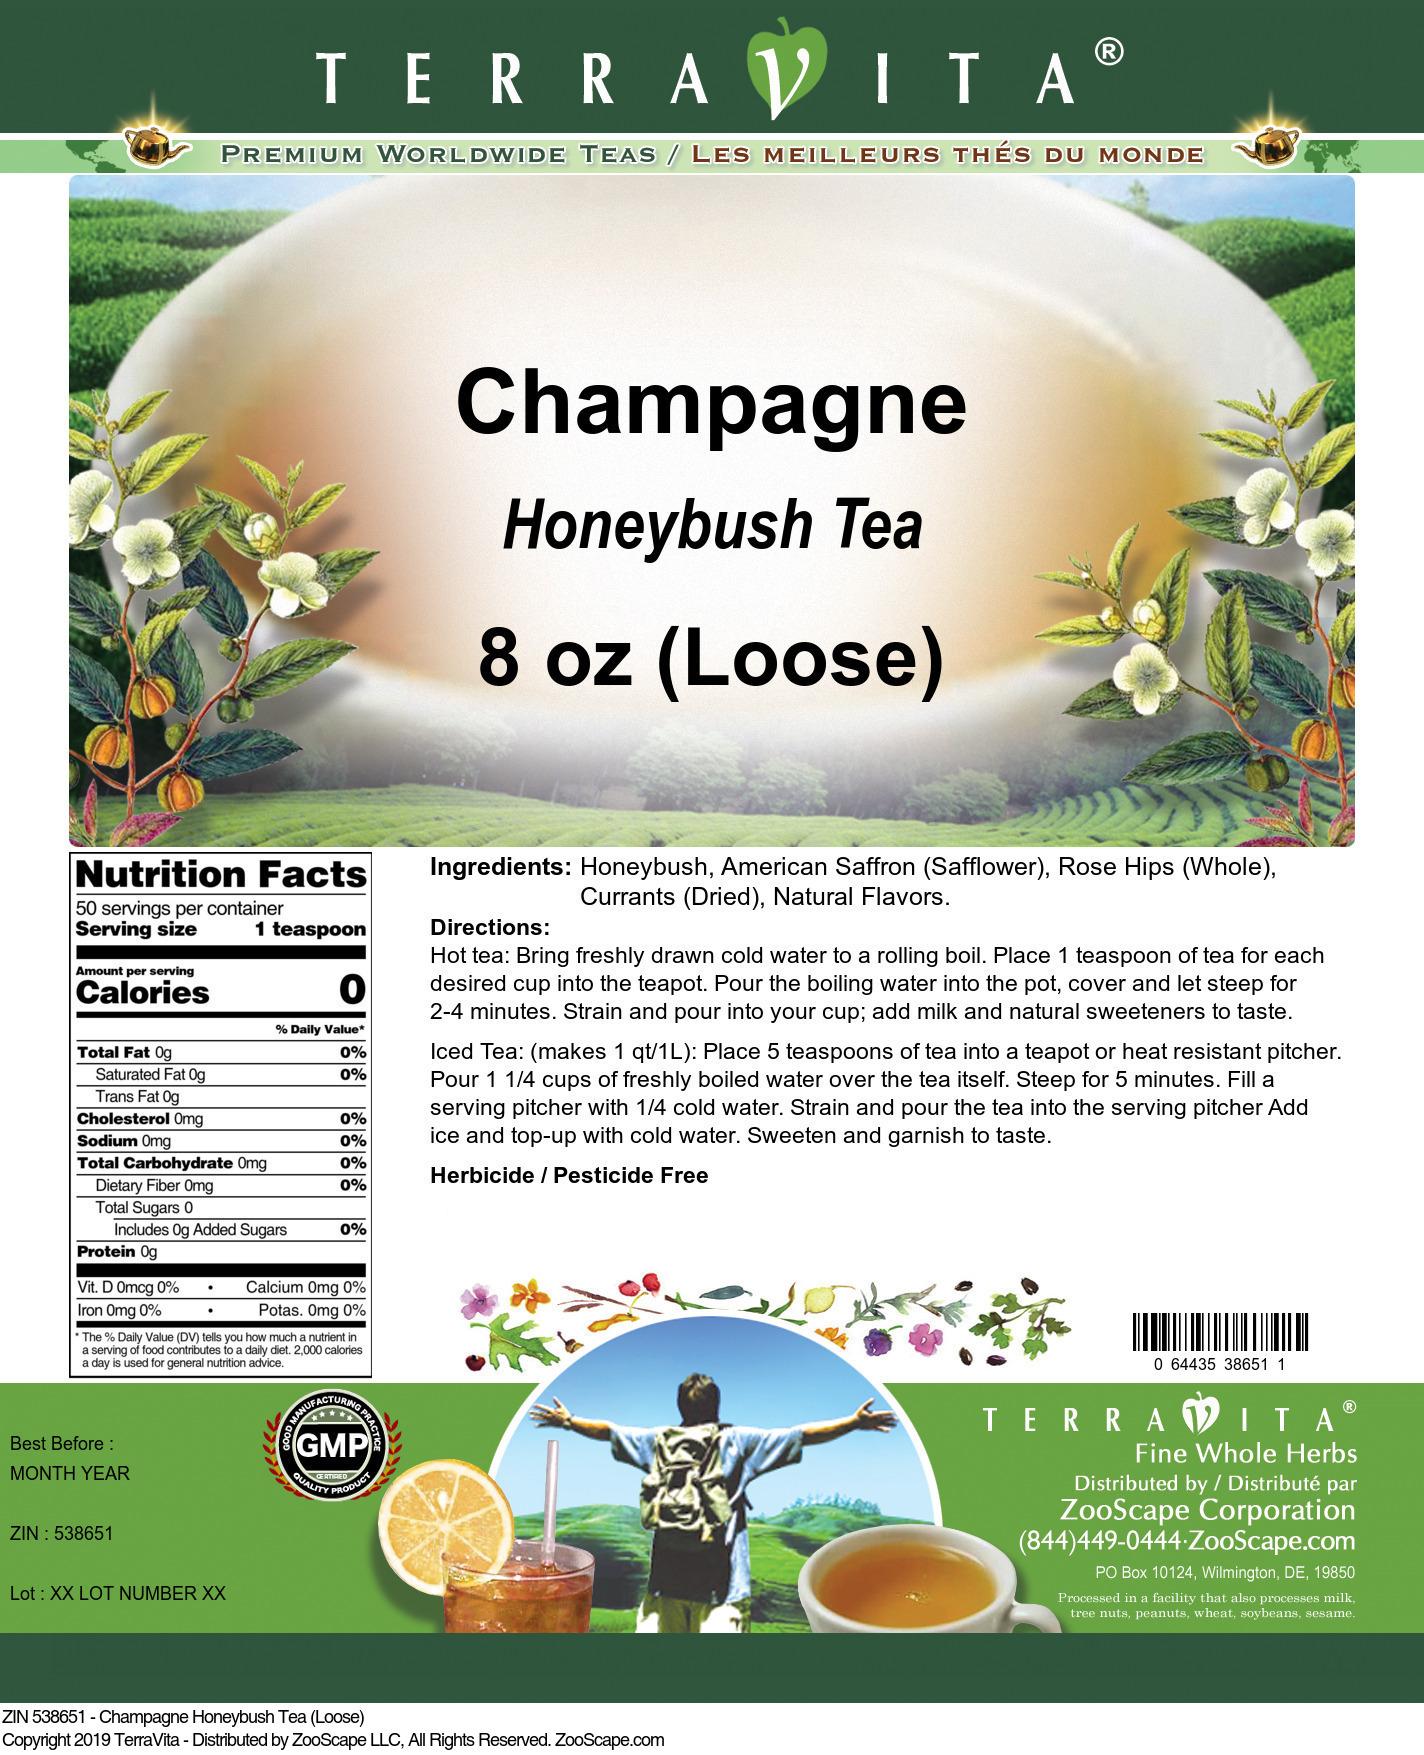 Champagne Honeybush Tea